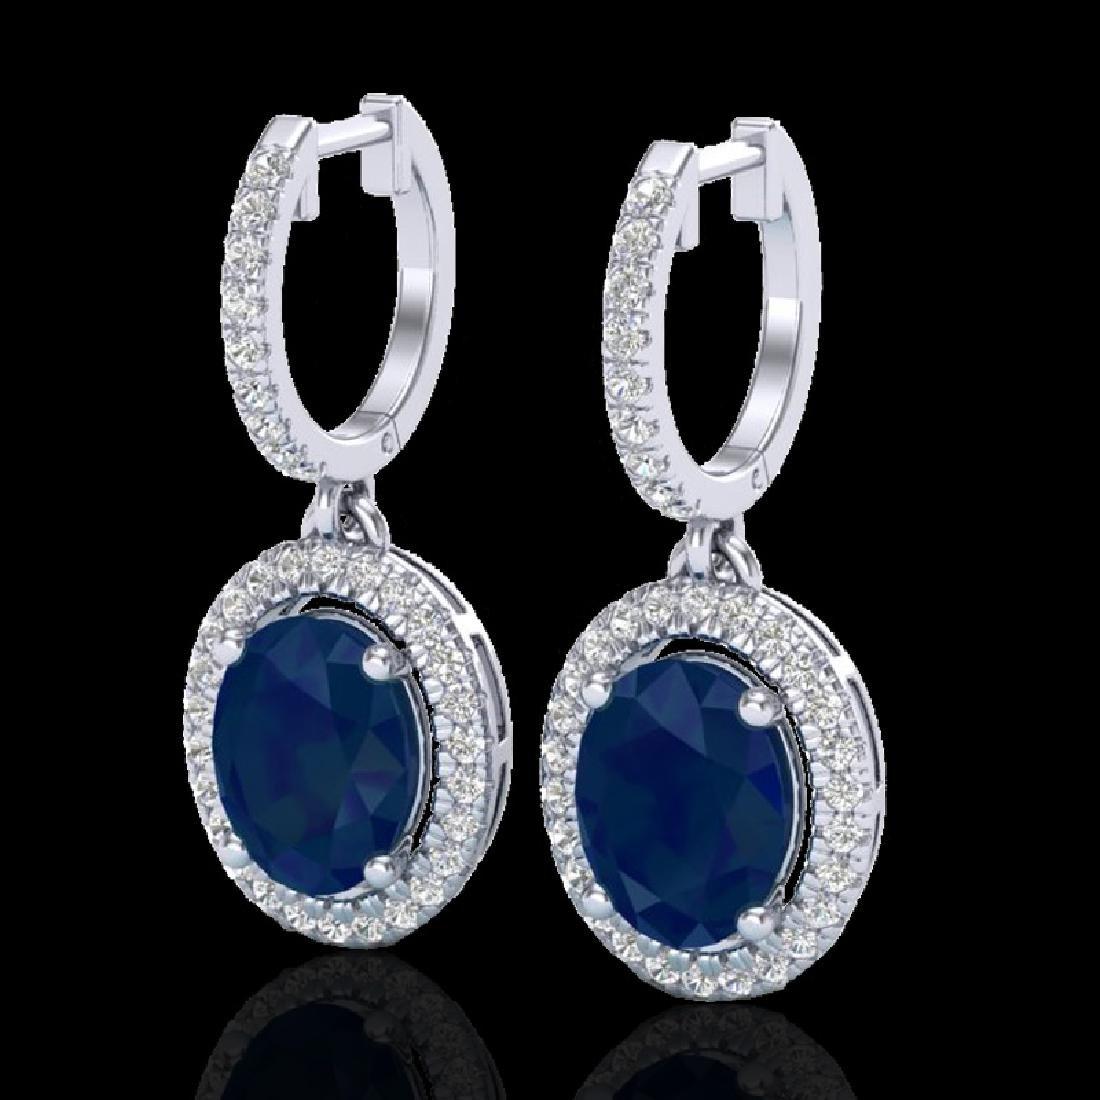 4.25 CTW Sapphire & Micro Pave VS/SI Diamond Earrings